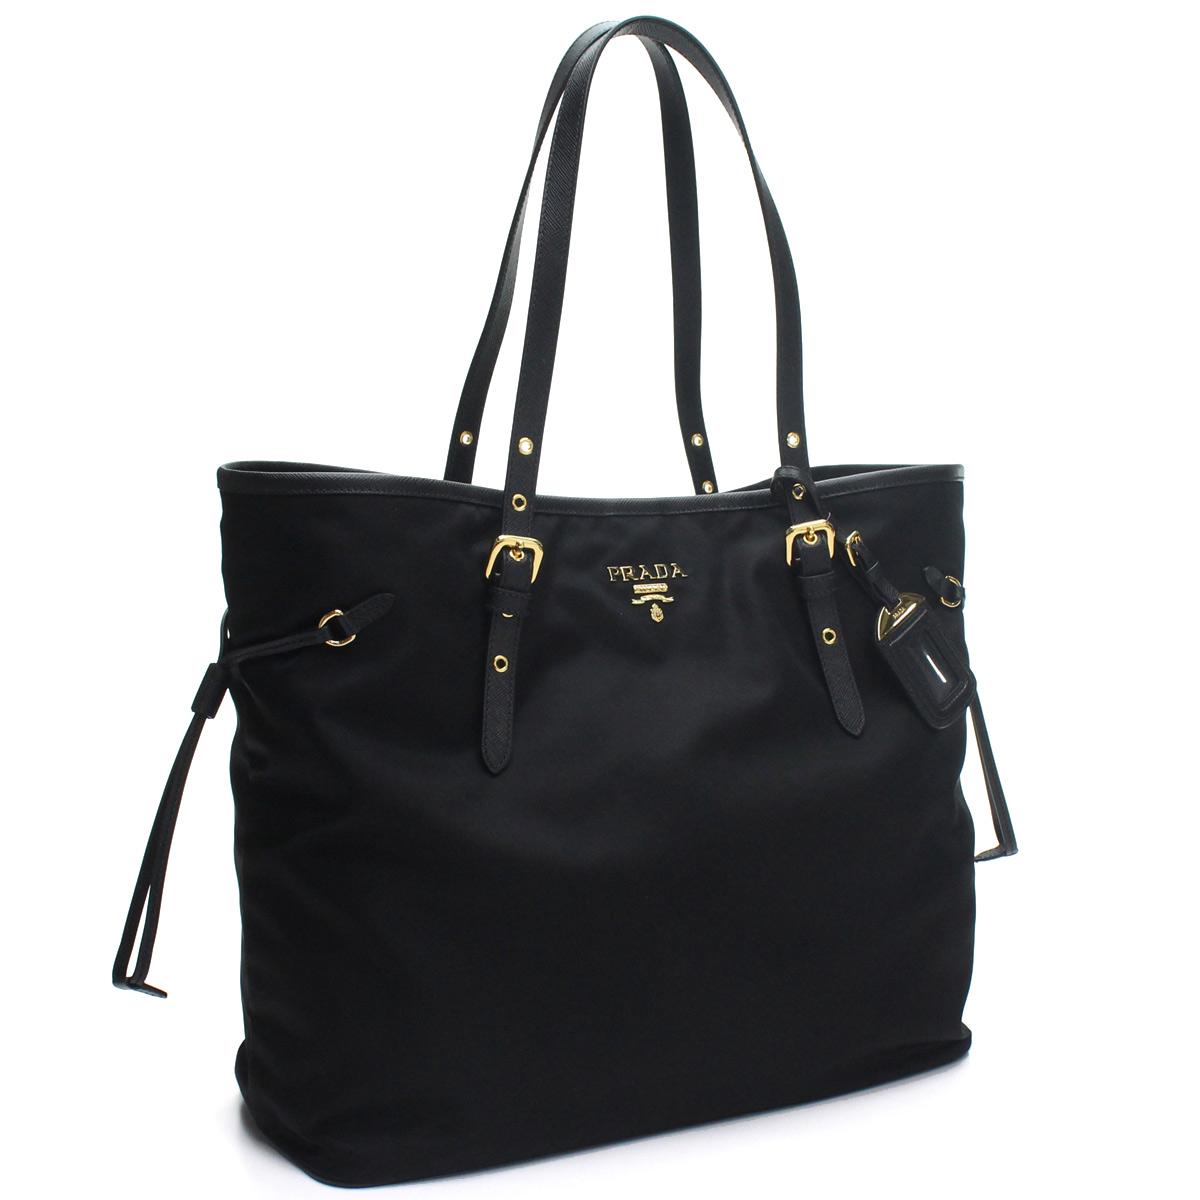 b50732167c43 Bighit The total brand wholesale  Prada outlet PRADA(OUTLET) nylon tote bag  1BG997-O ZMY F0002 NERO black